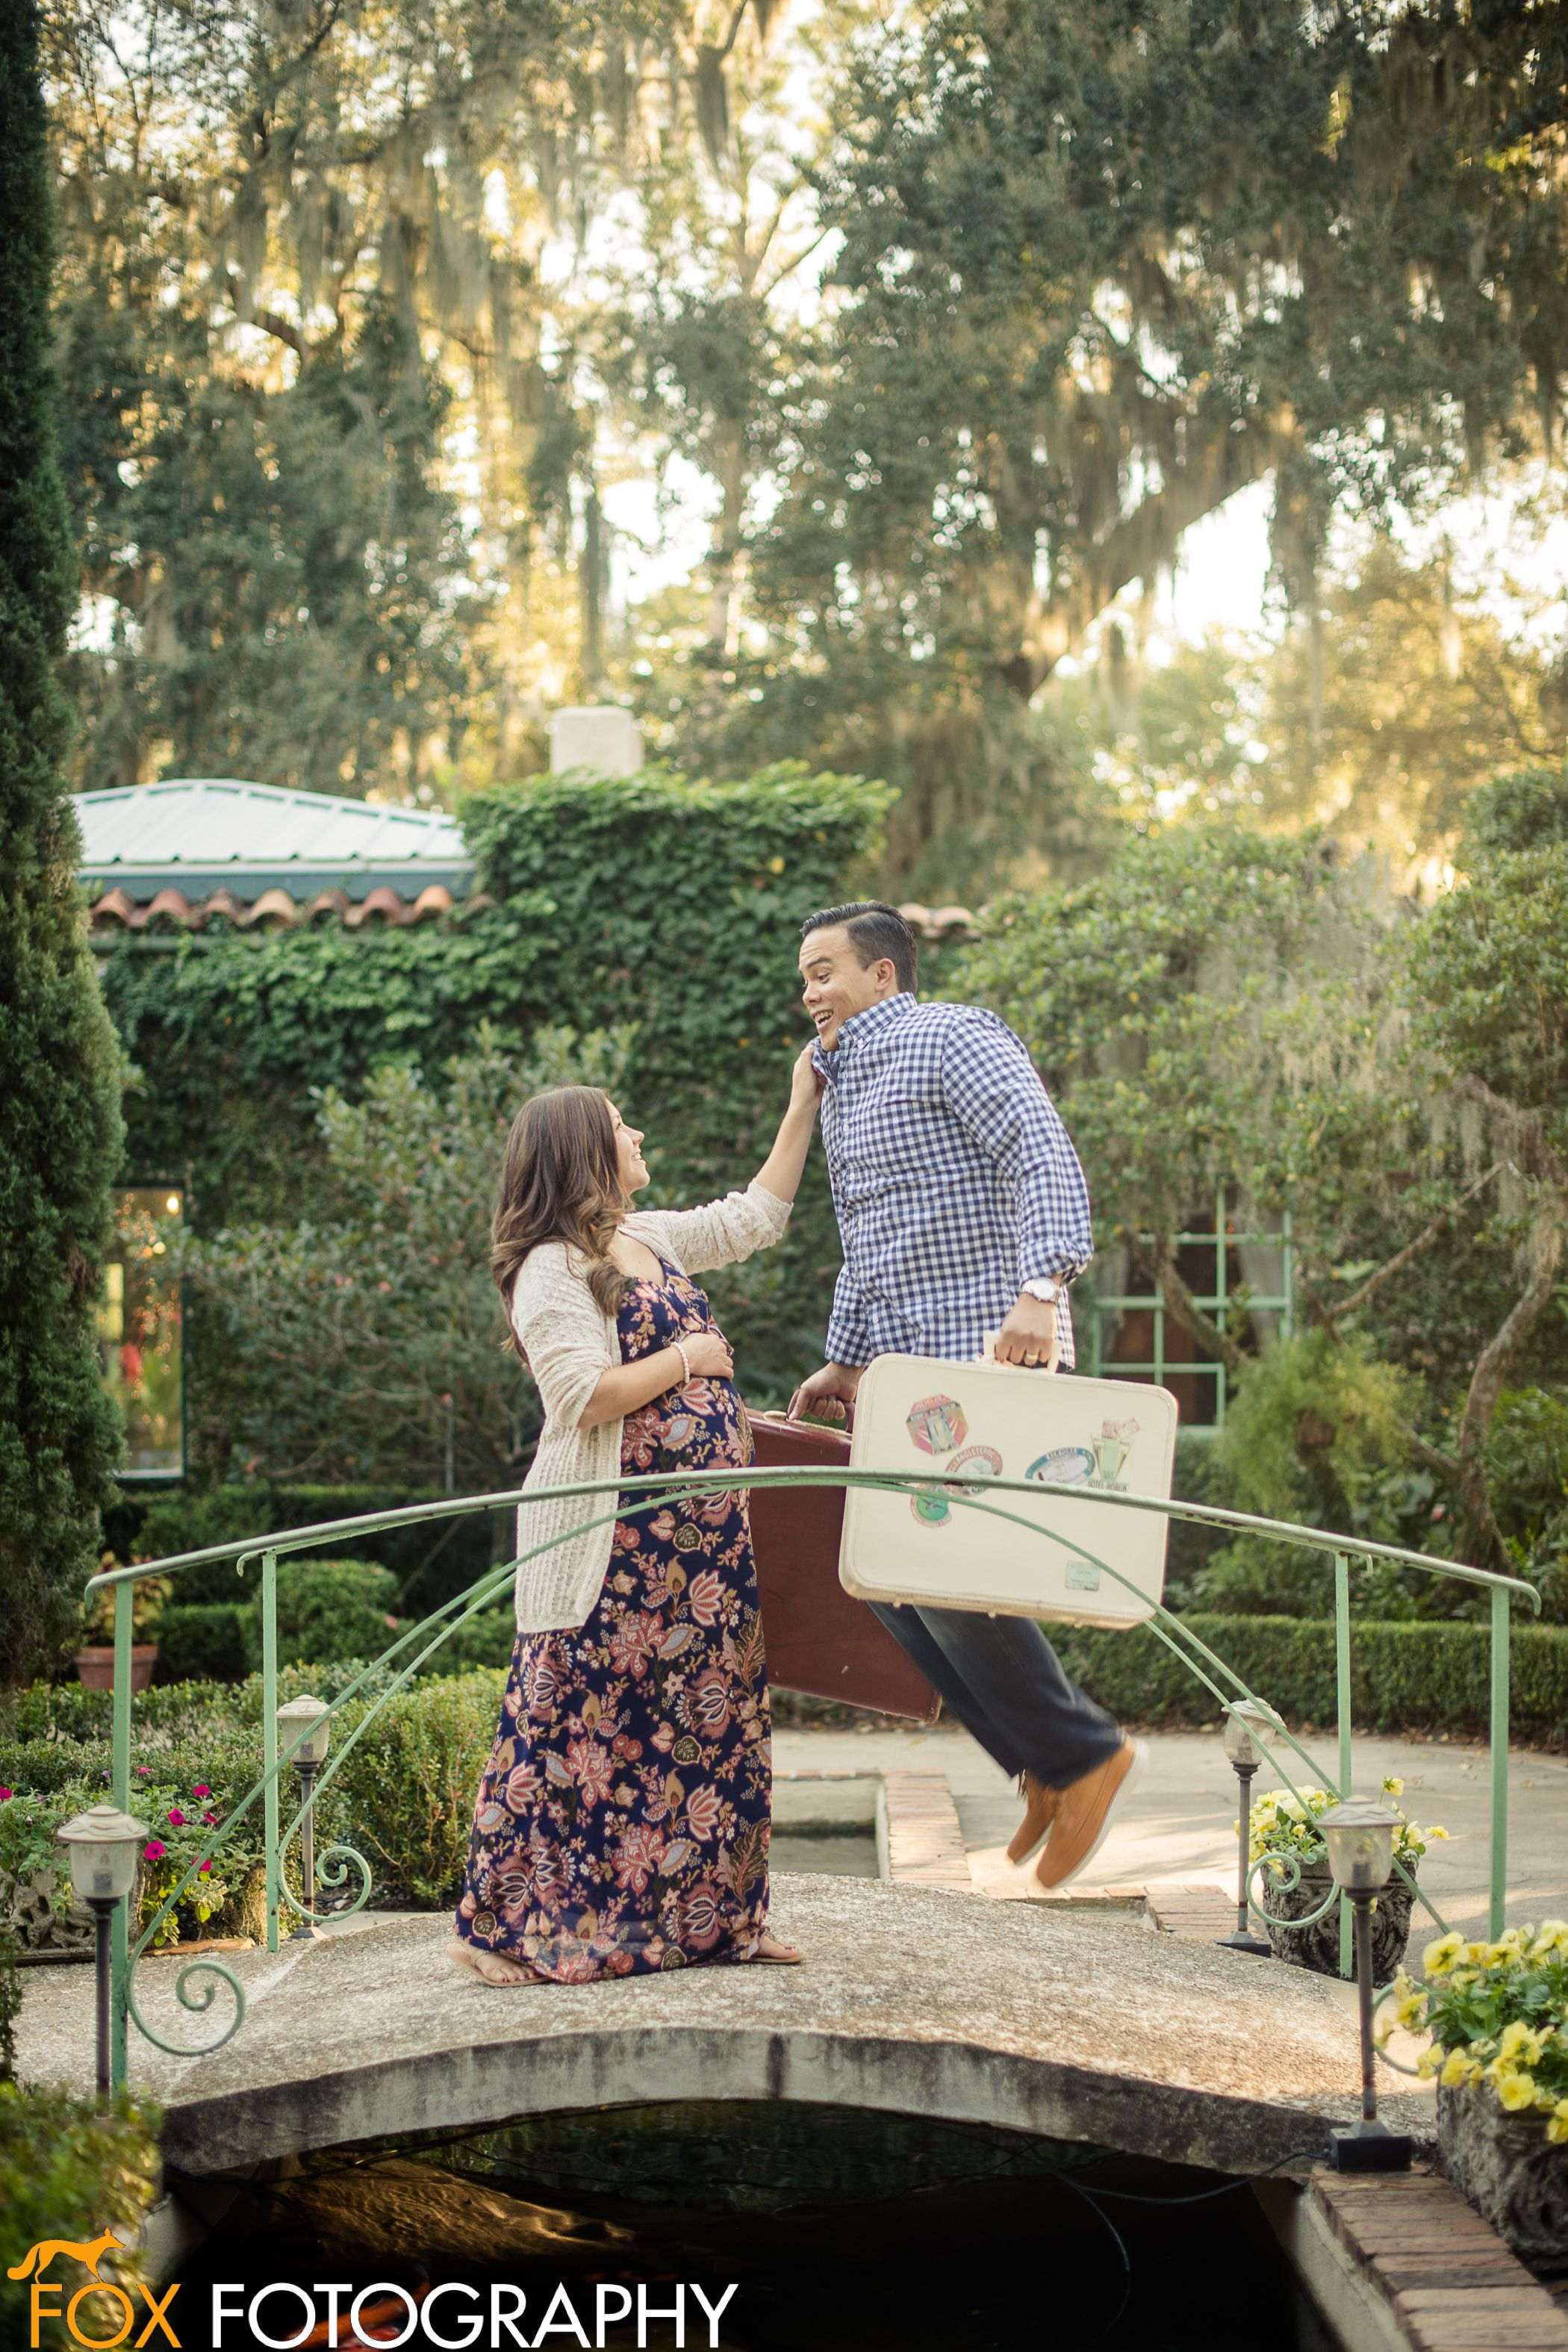 continental romance datingpipeline hookup in unix